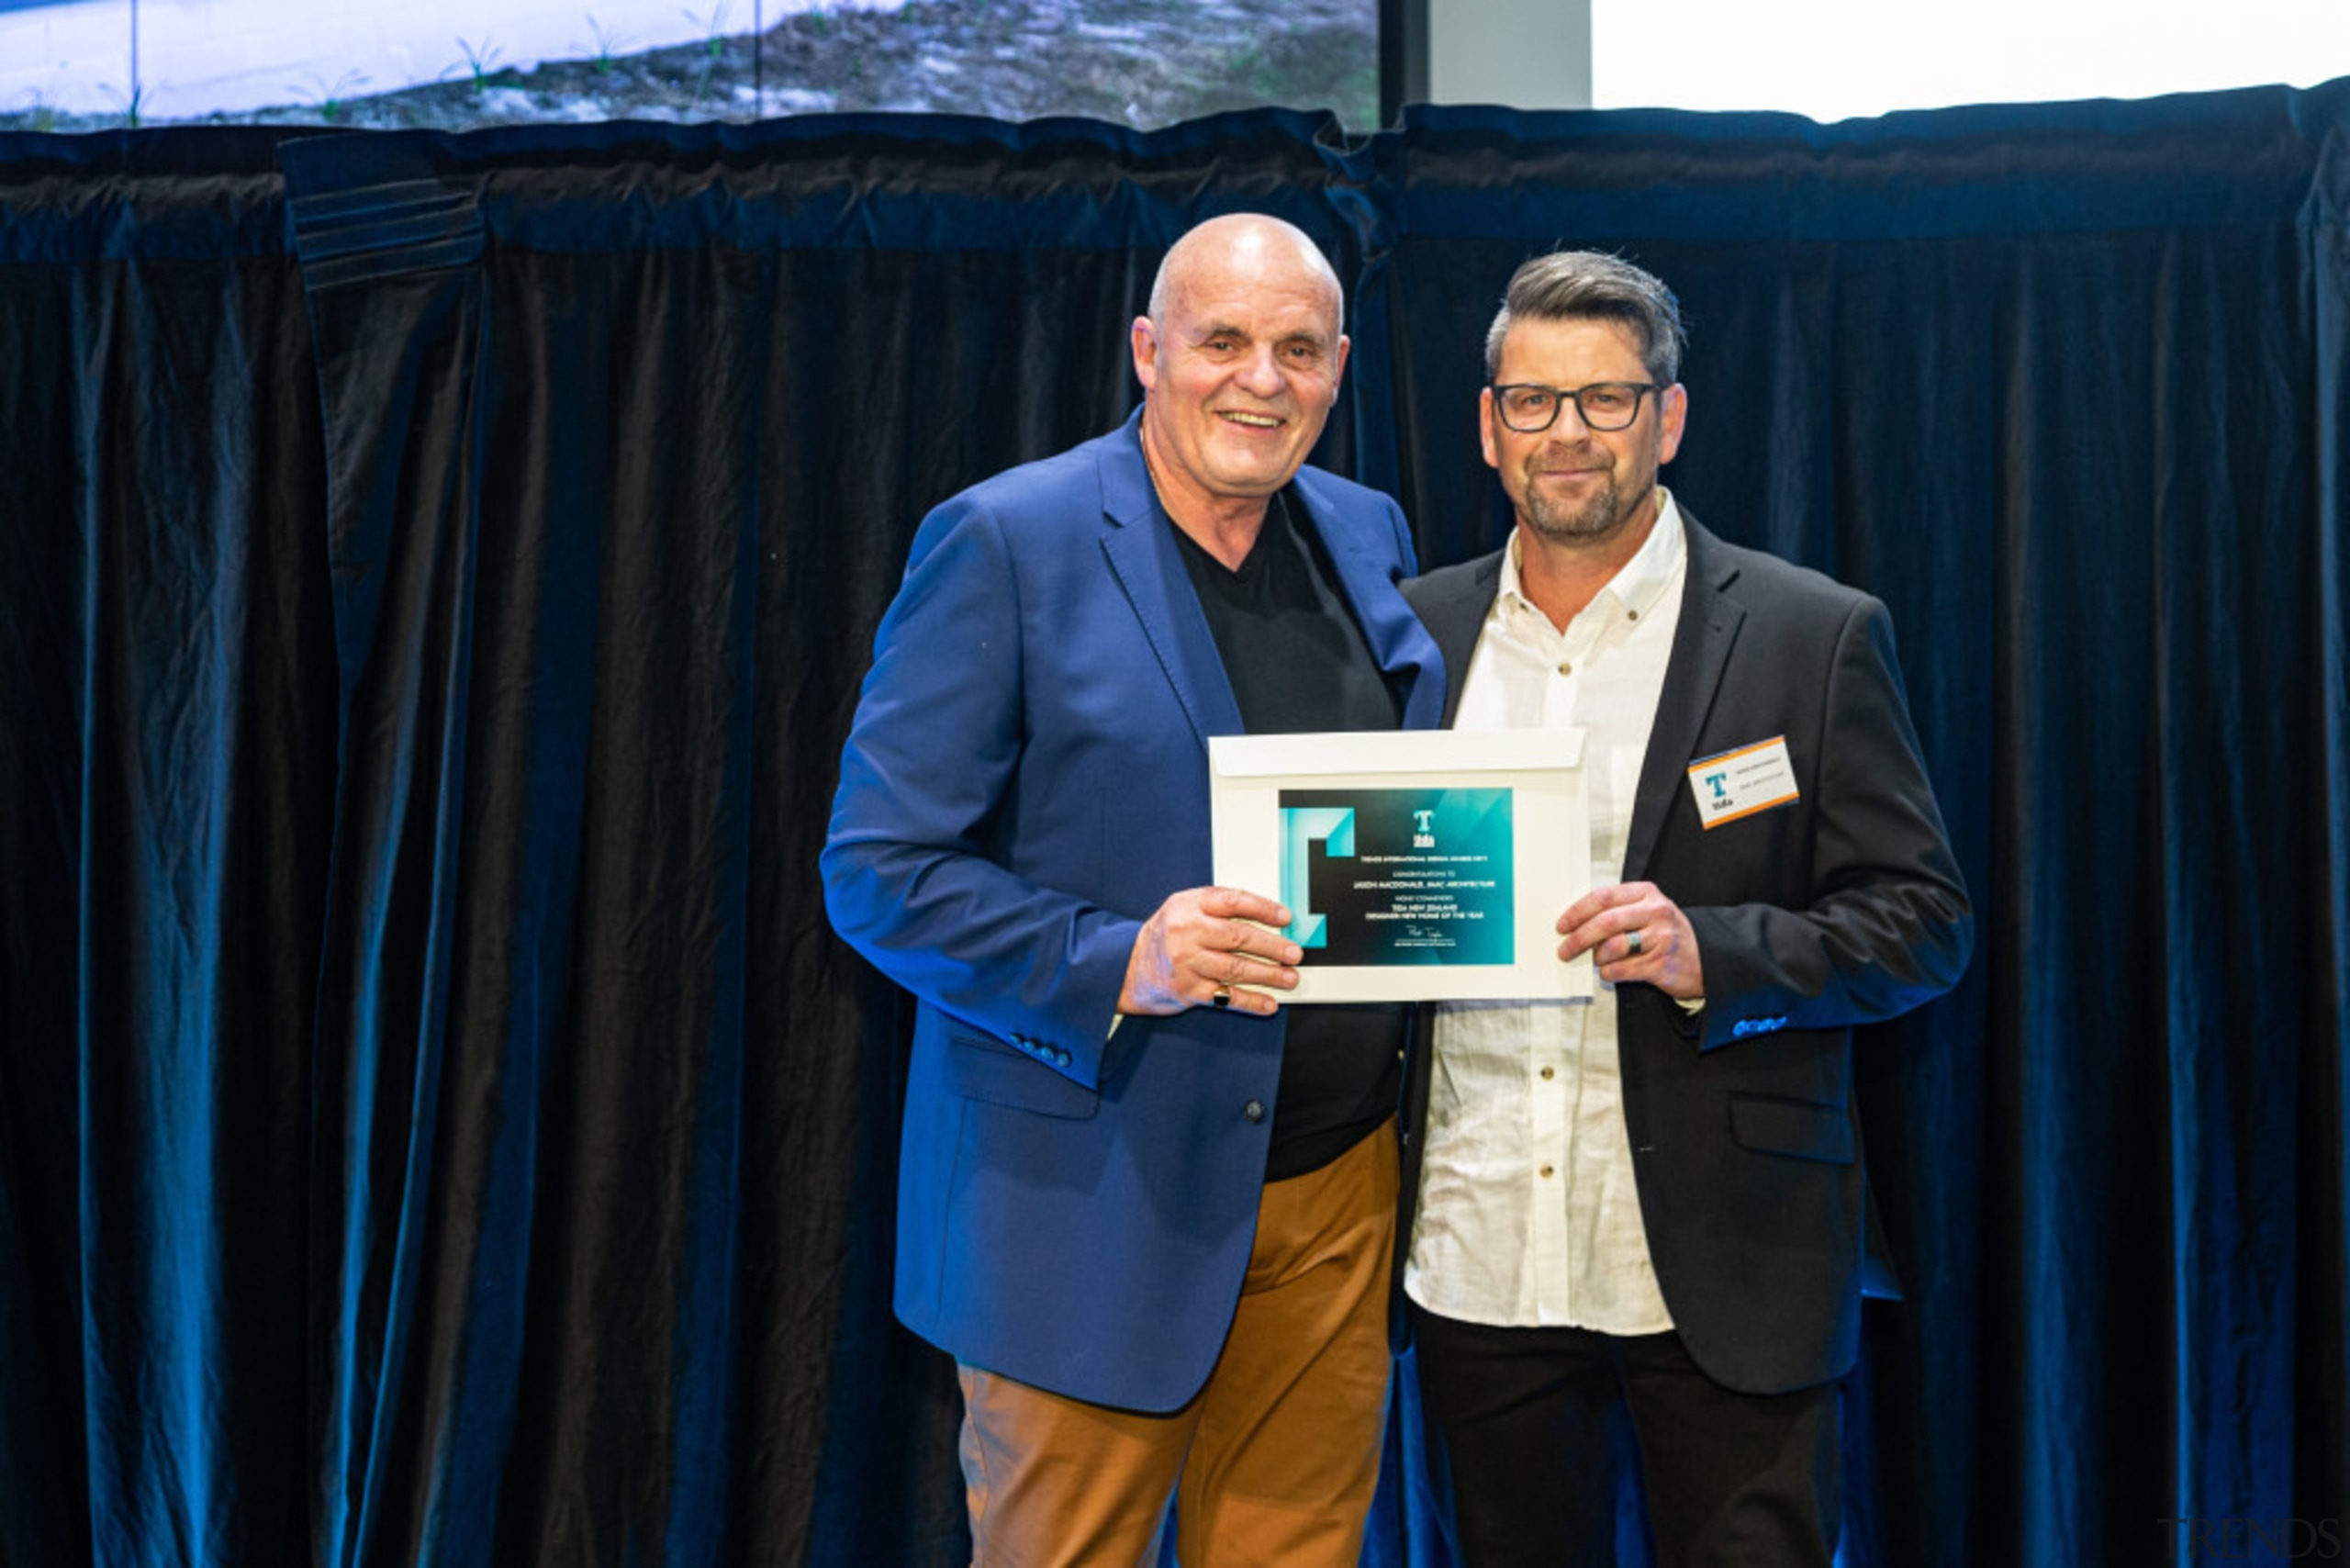 2019 TIDA New Zealand Homes presentation evening award, award ceremony, community, event, blue, black